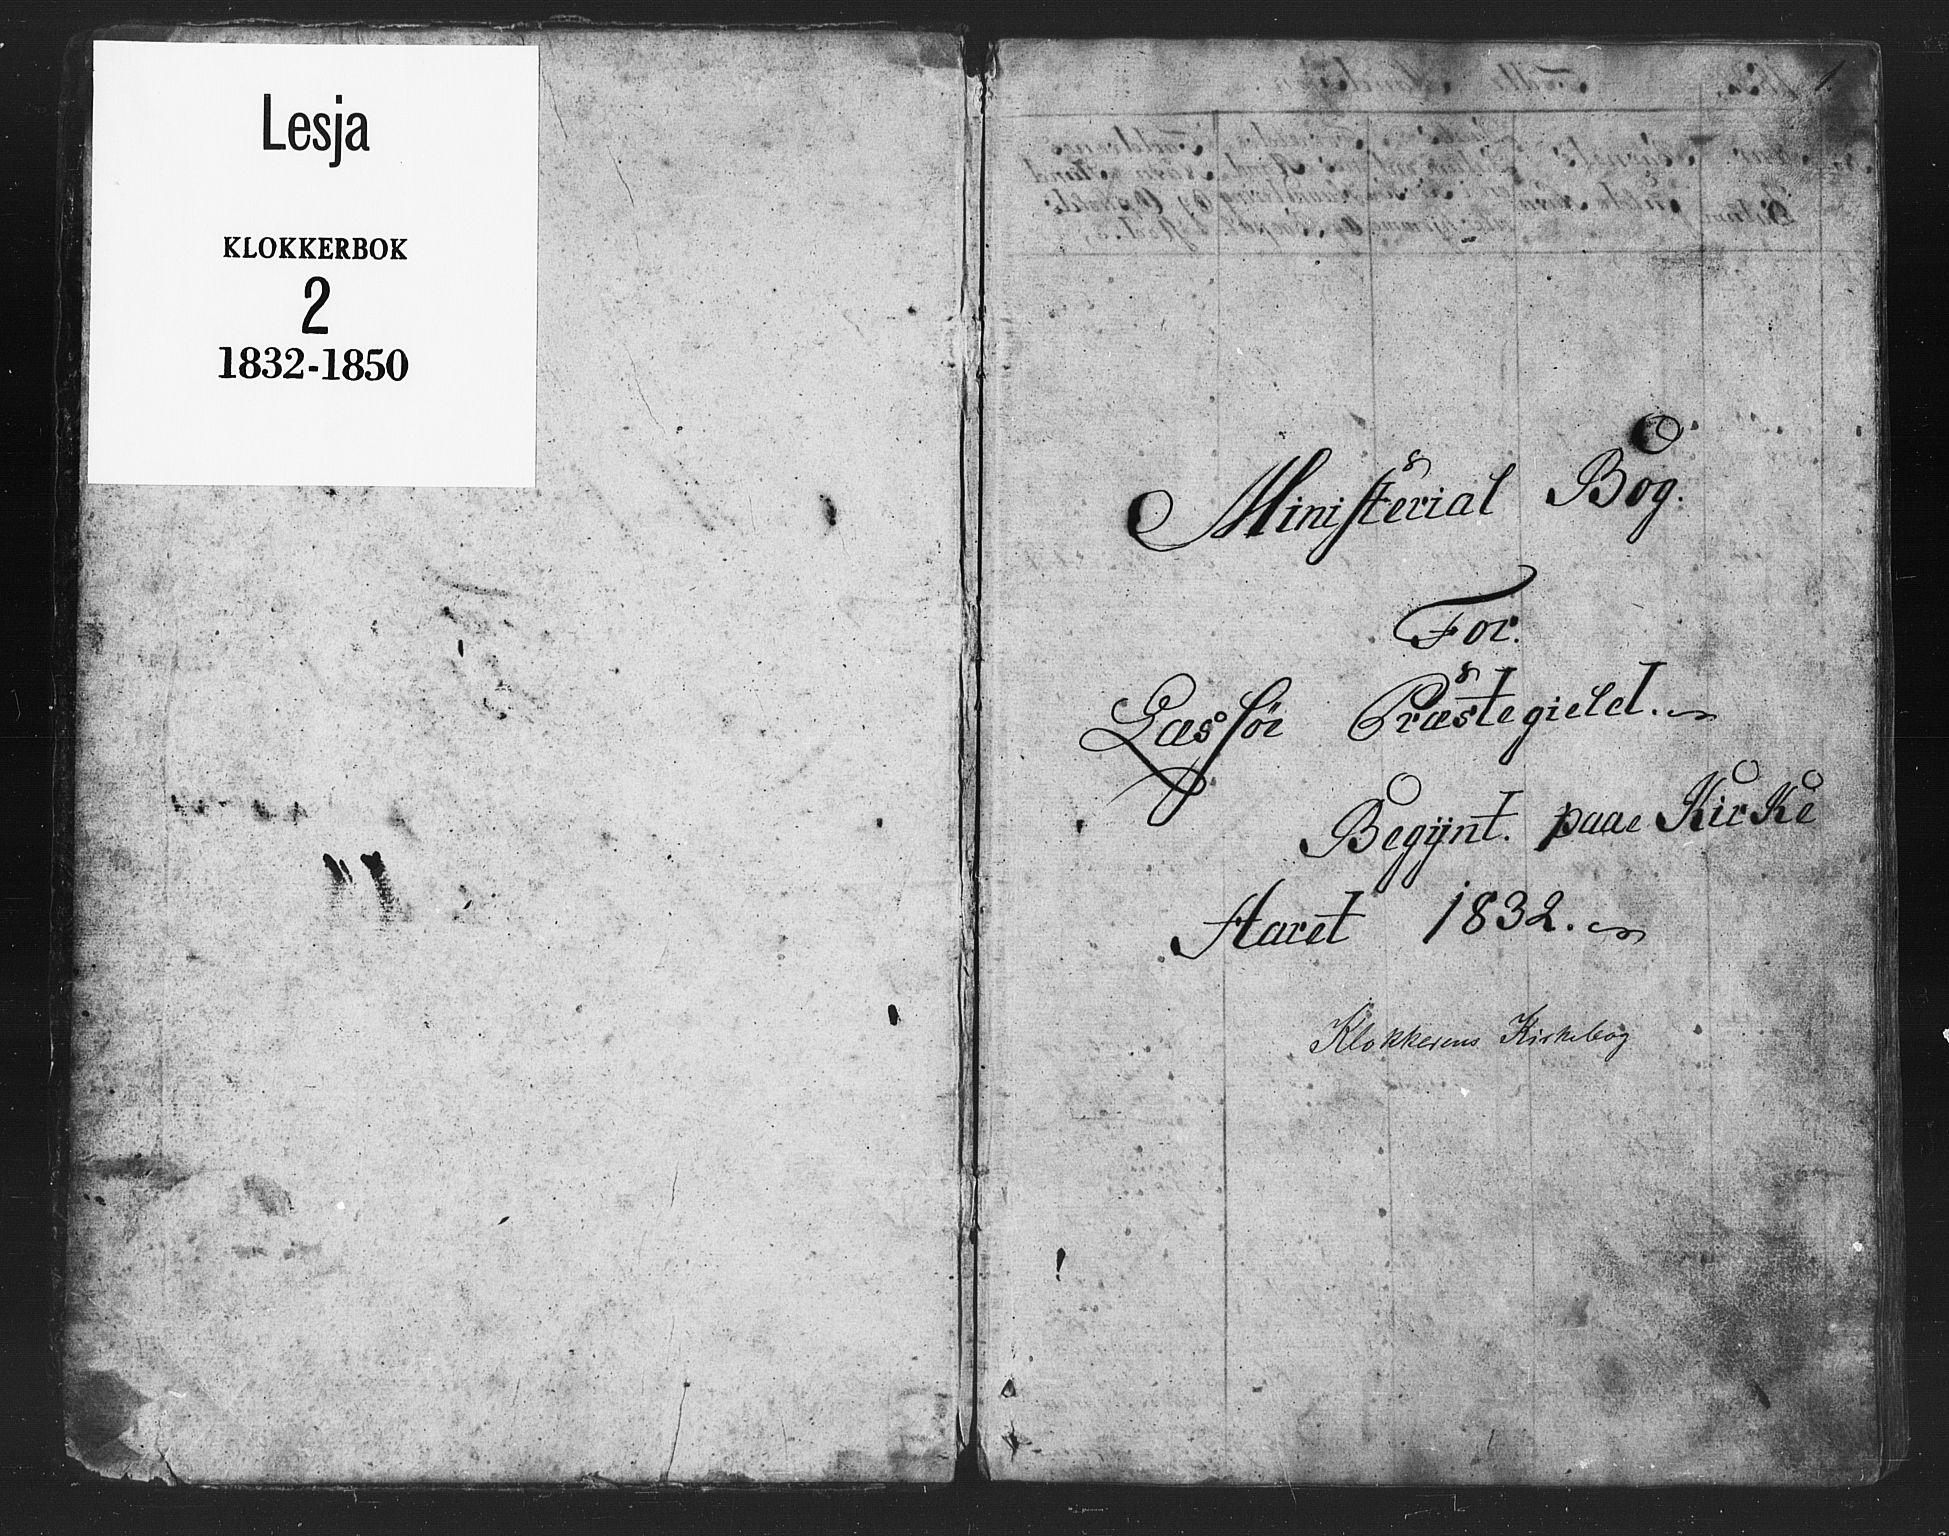 SAH, Lesja prestekontor, Klokkerbok nr. 2, 1832-1850, s. 1